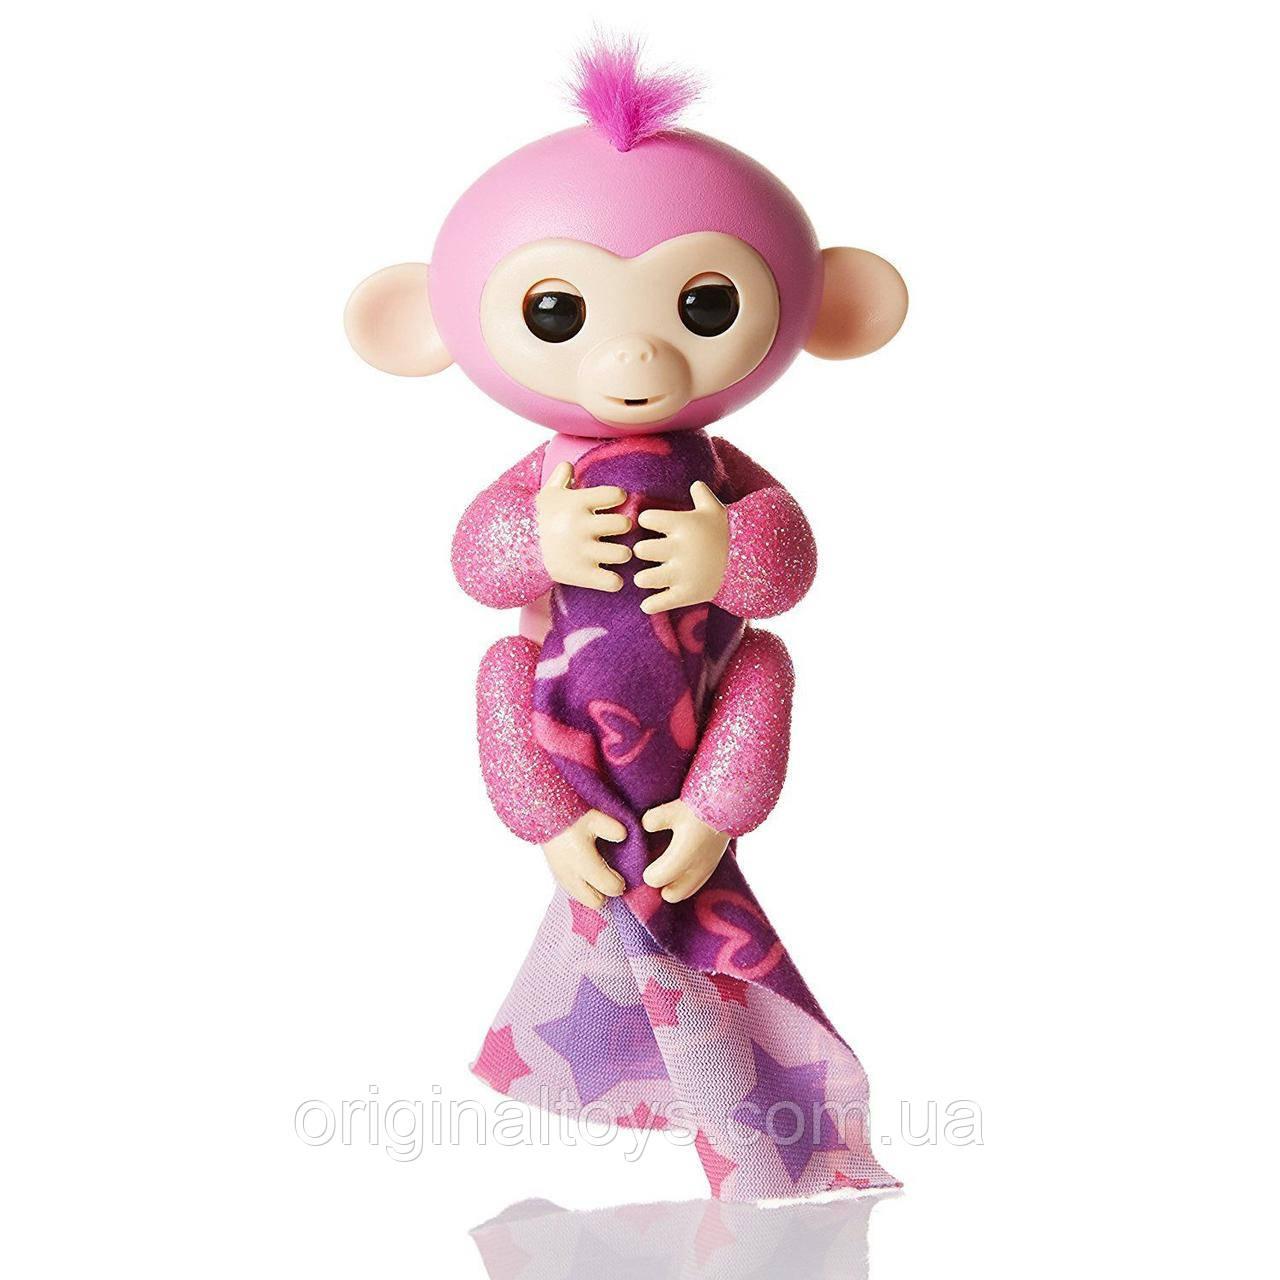 Интерактивная ручная блестящая обезьянка Fingerlings Роза с аксессуаром WowWee